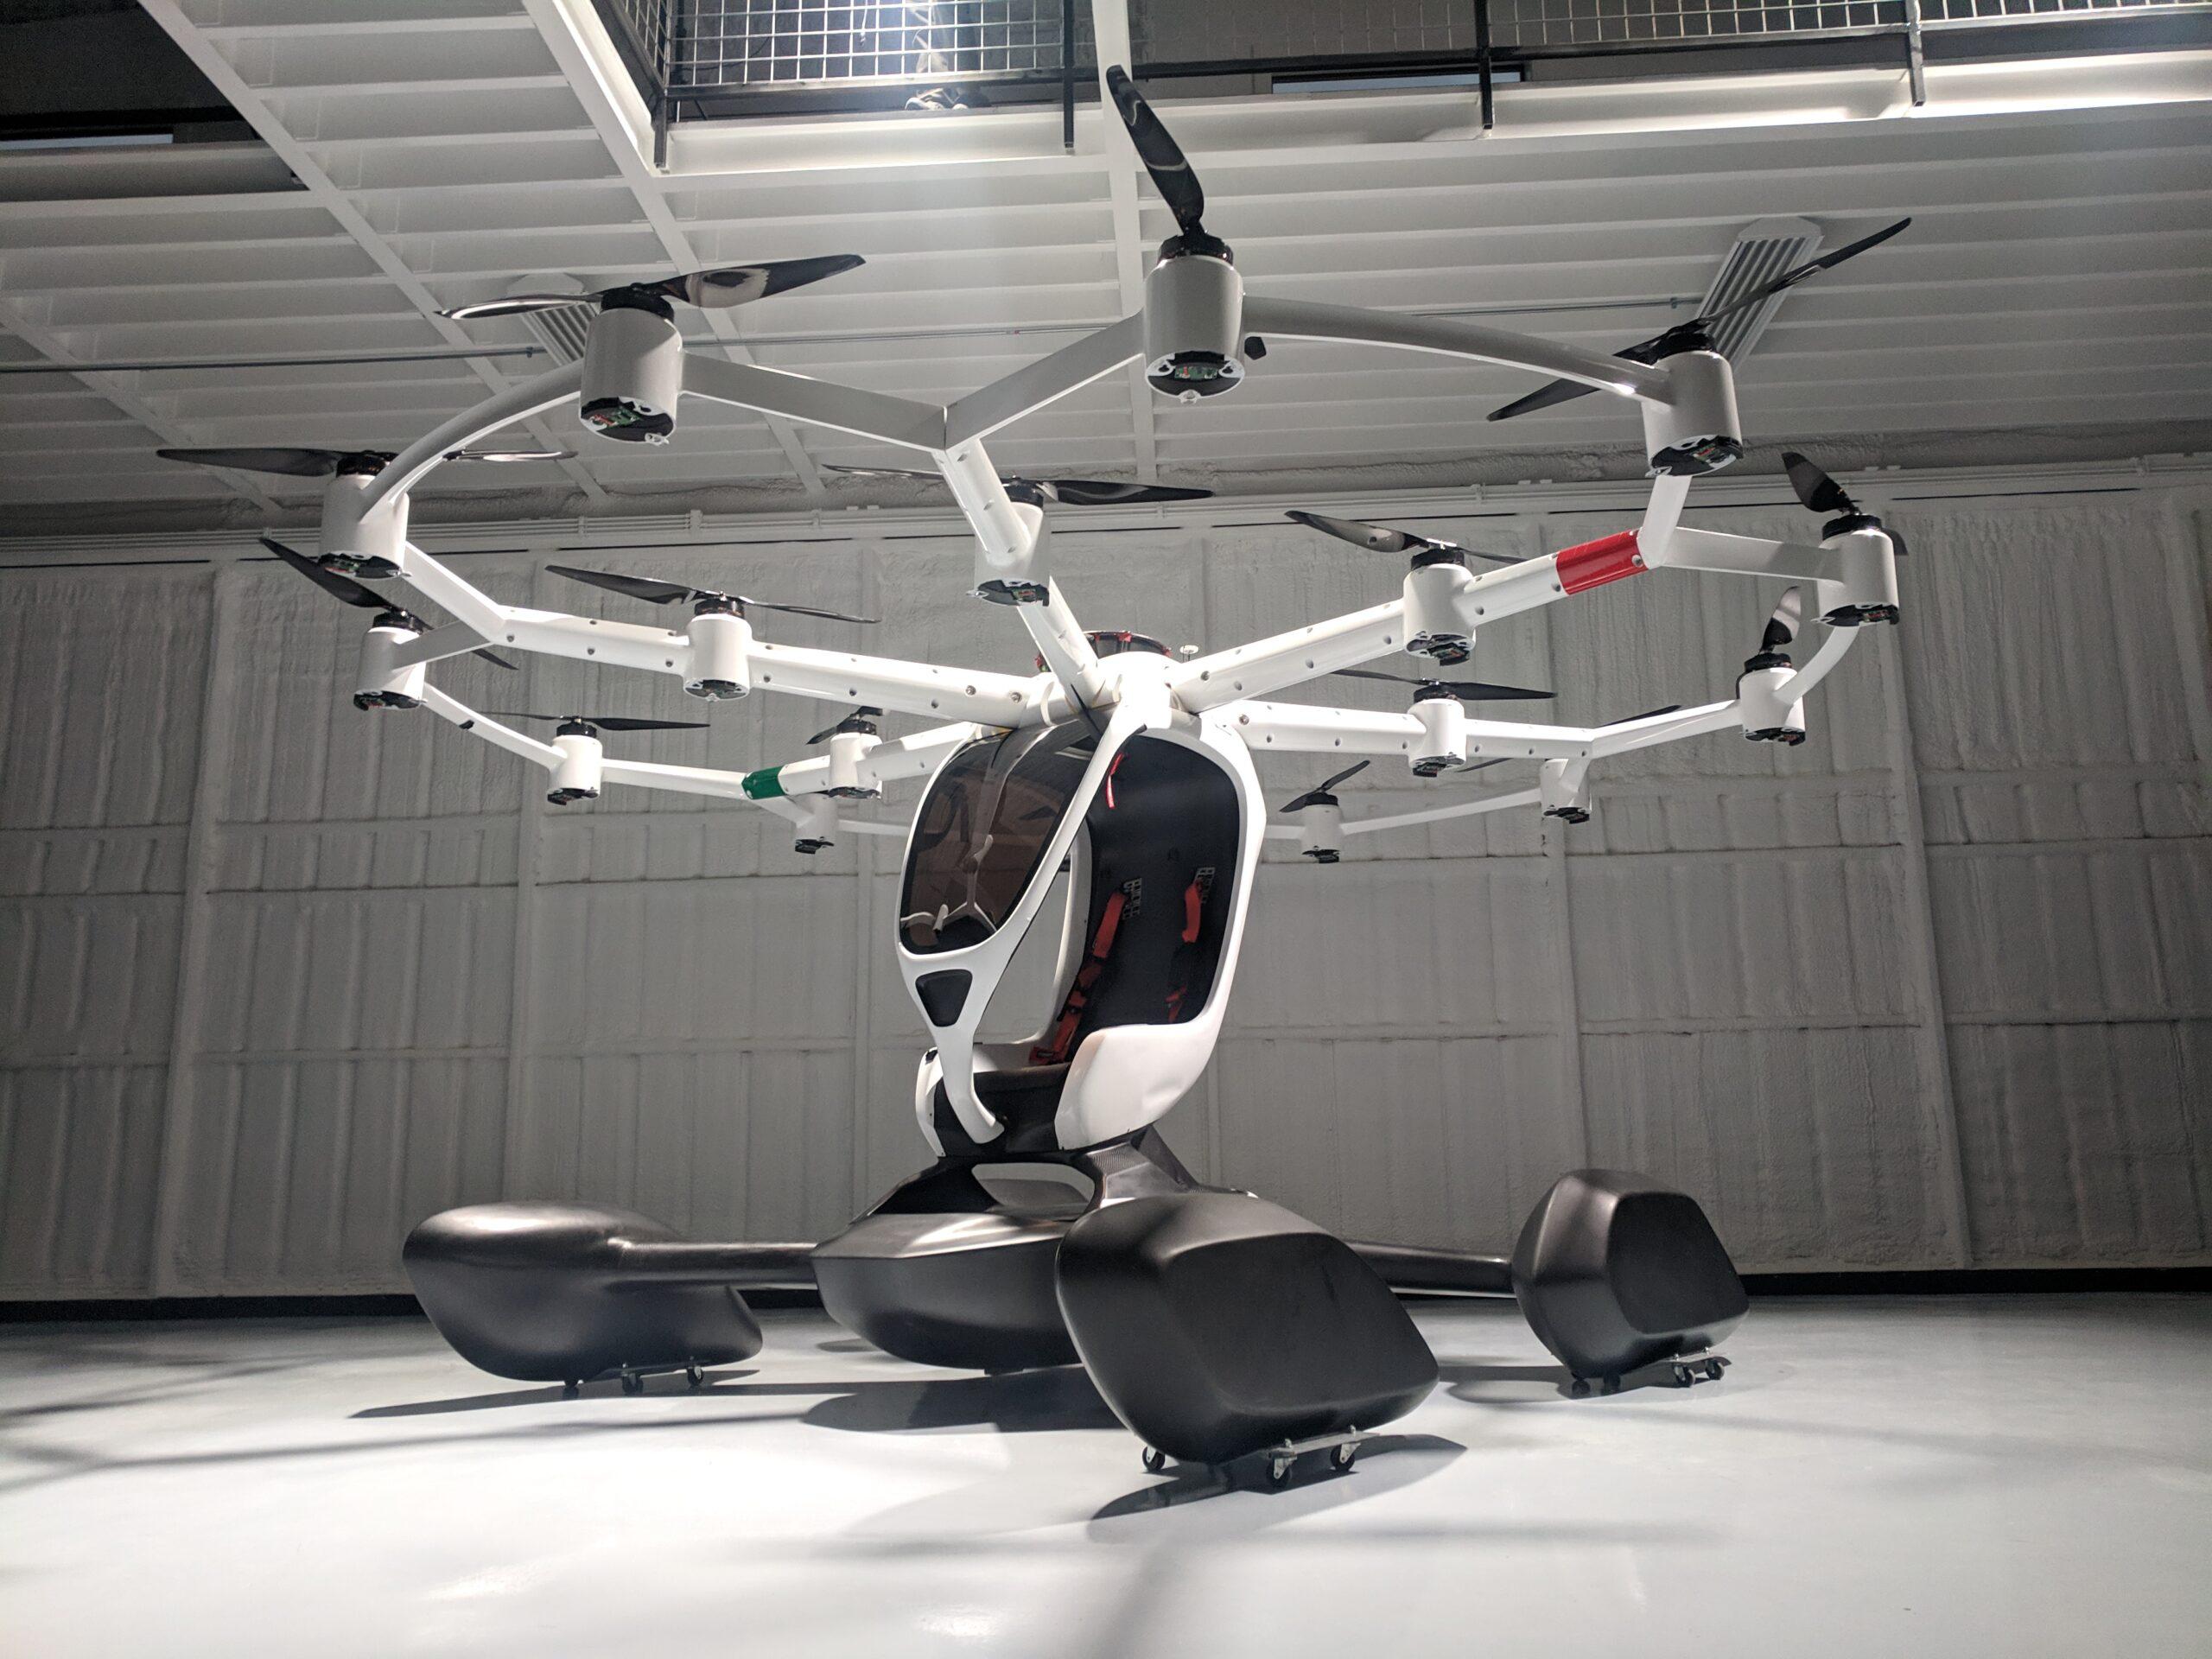 Hexa - a new type of aircraft